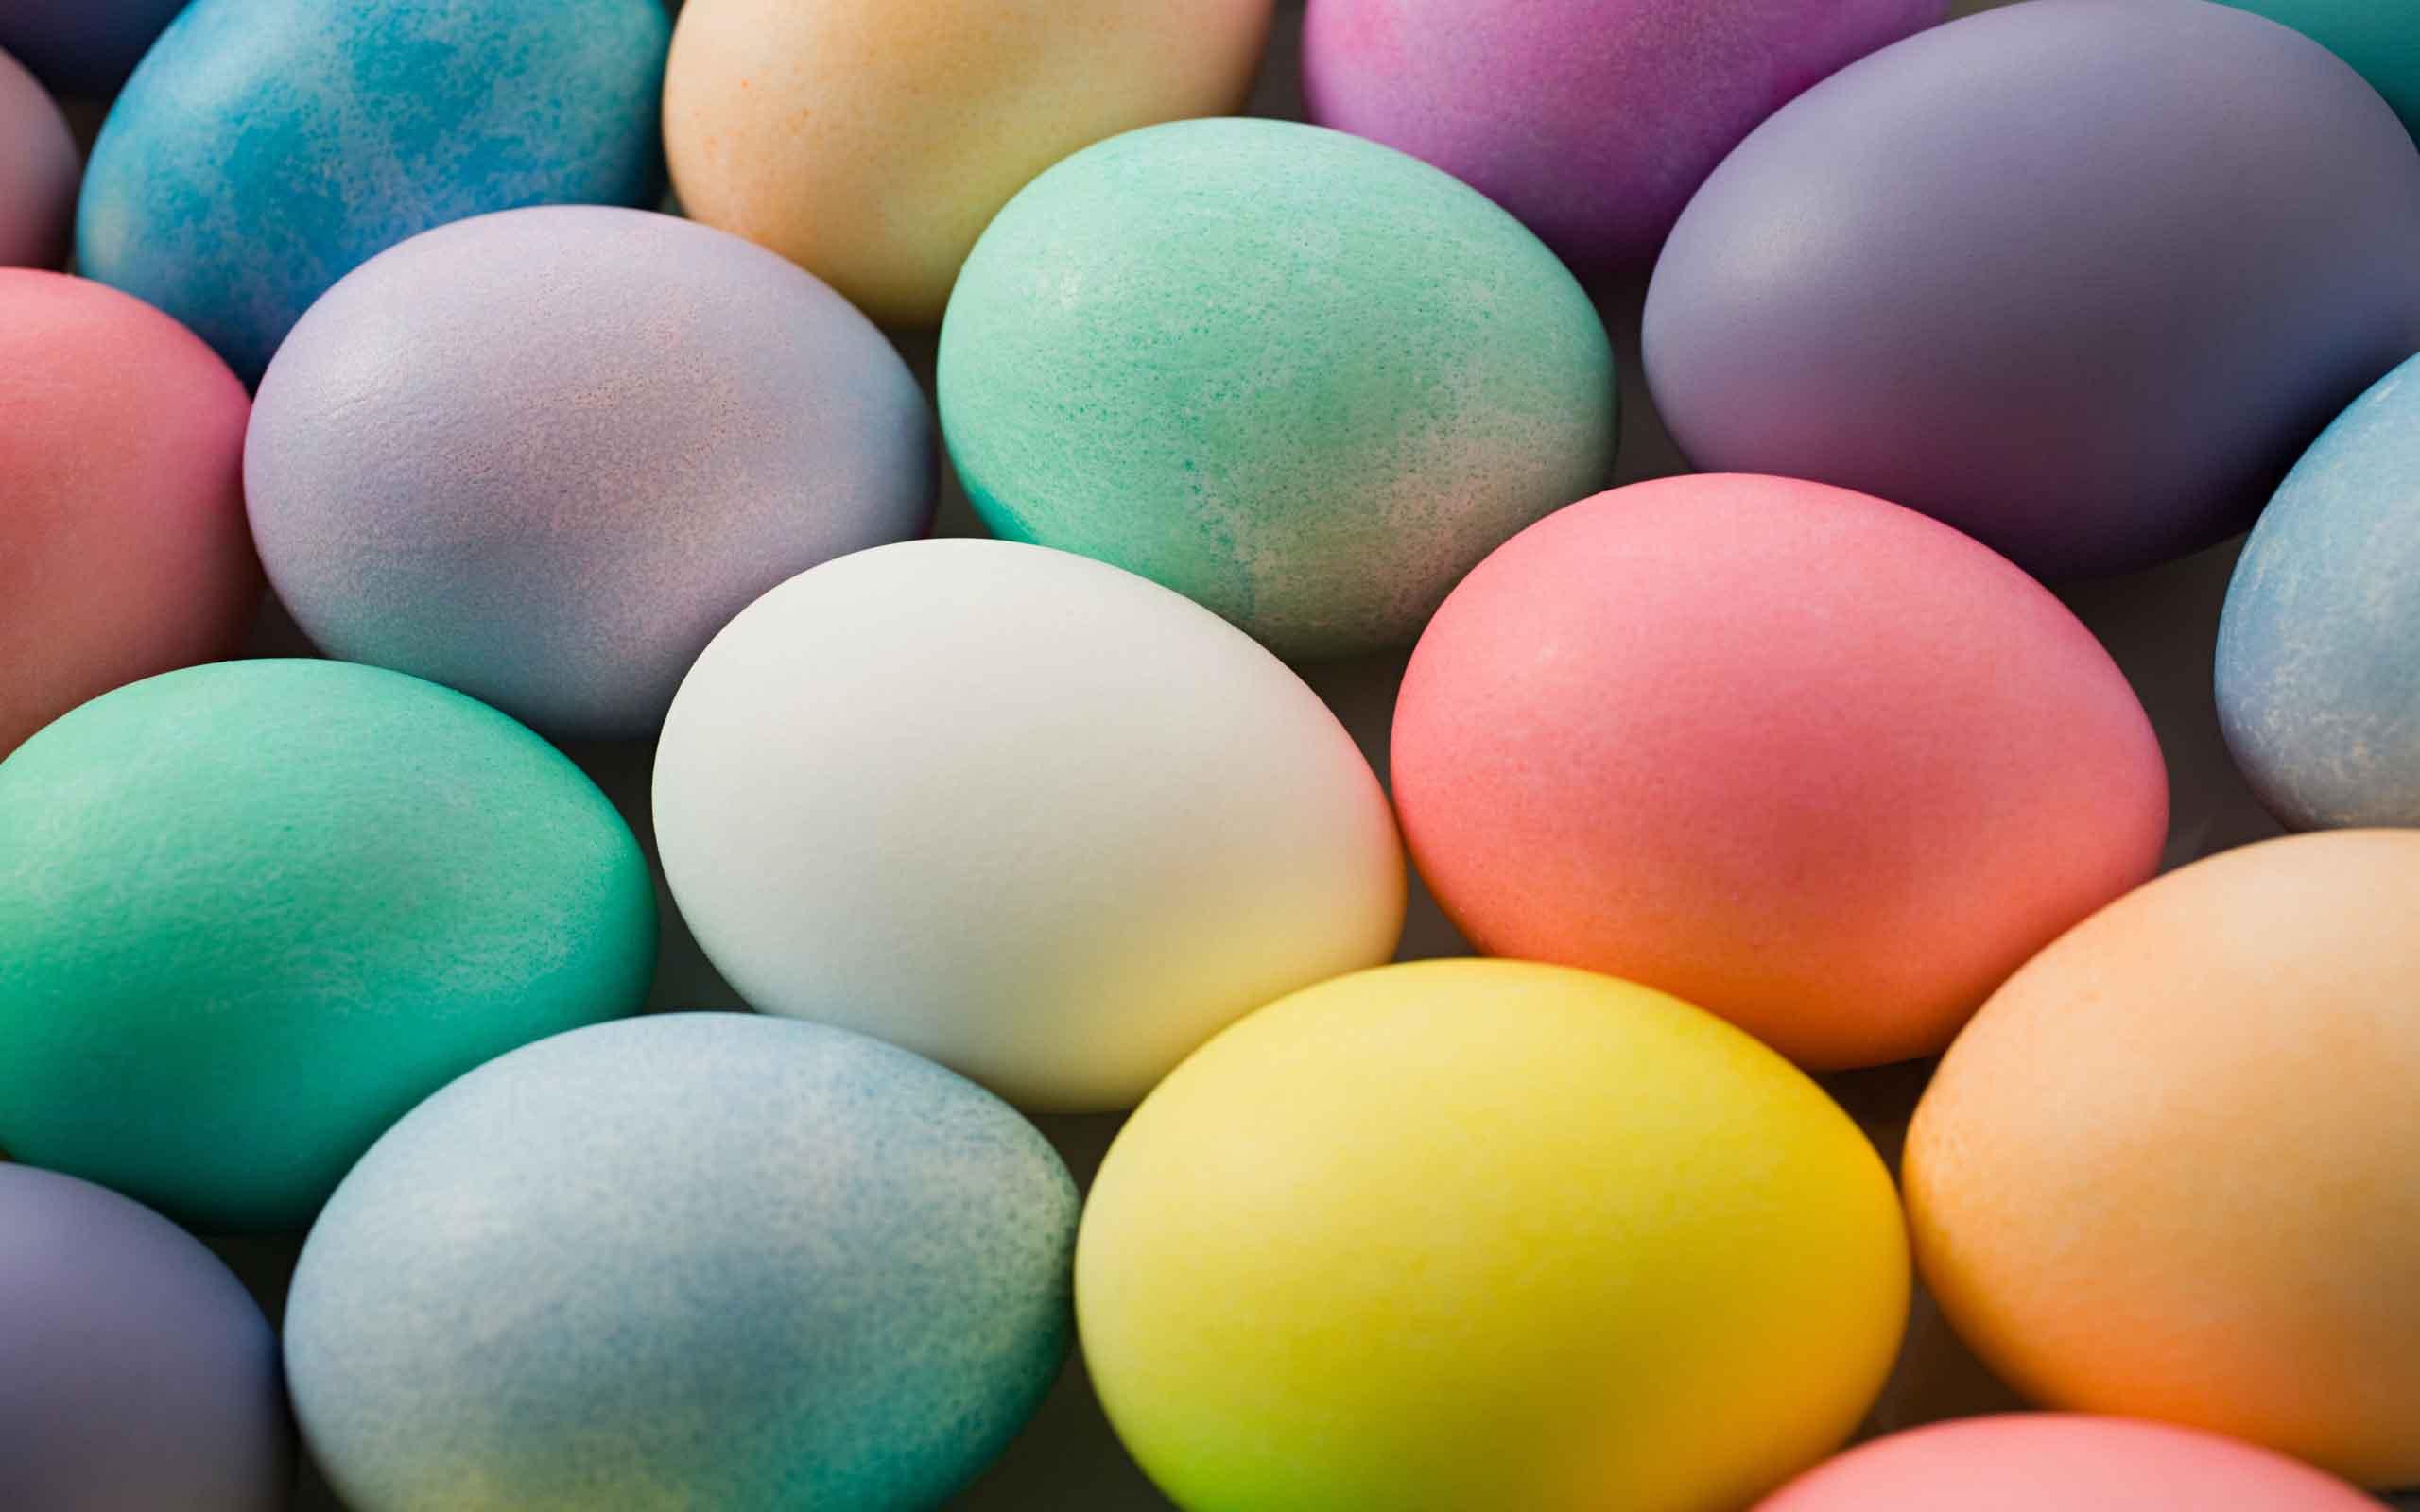 63 Easter Egg Wallpaper Free On Wallpapersafari